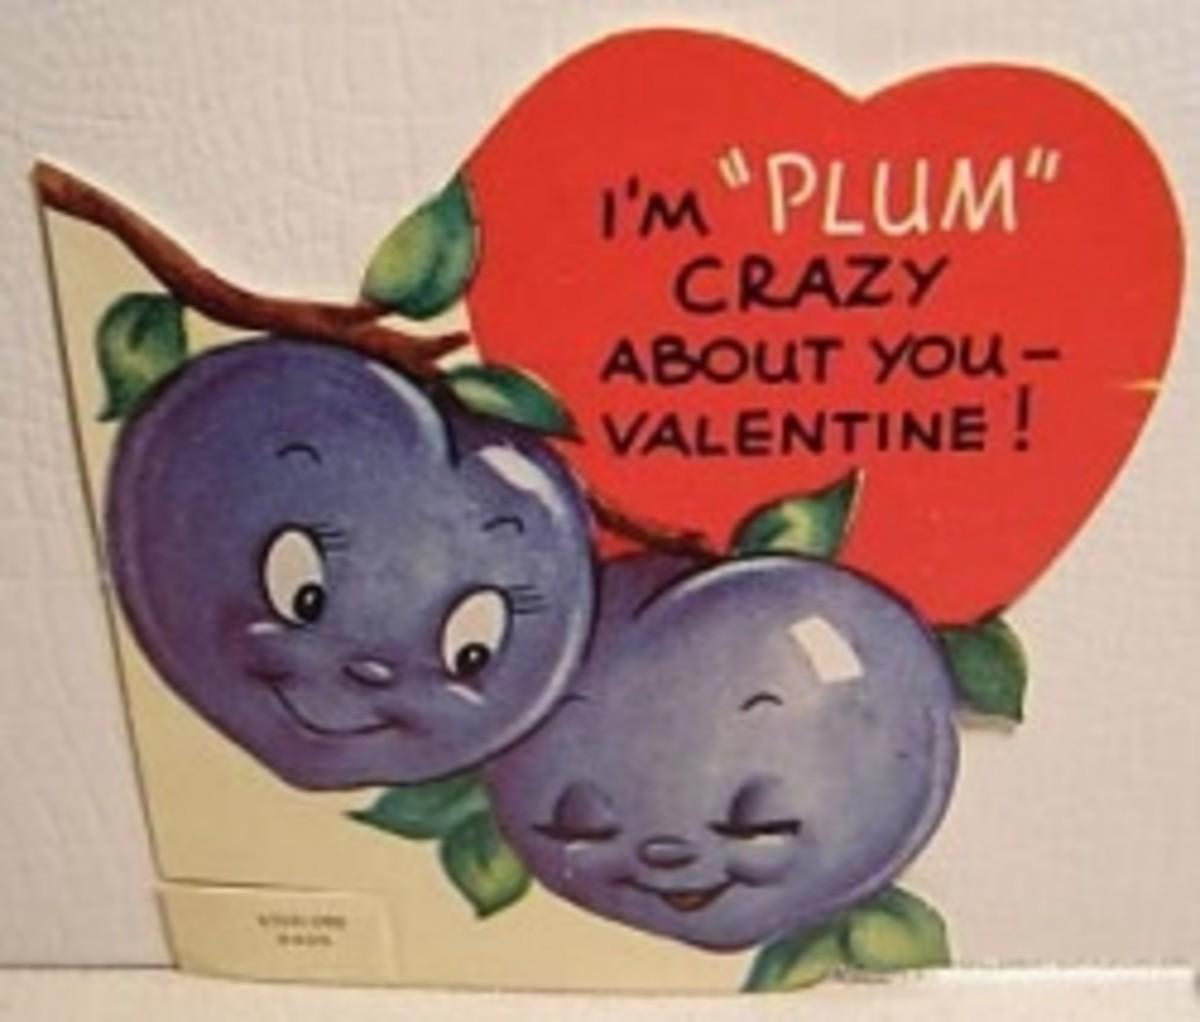 Wikimedia Vintage Valentine Art, Plum Crazy